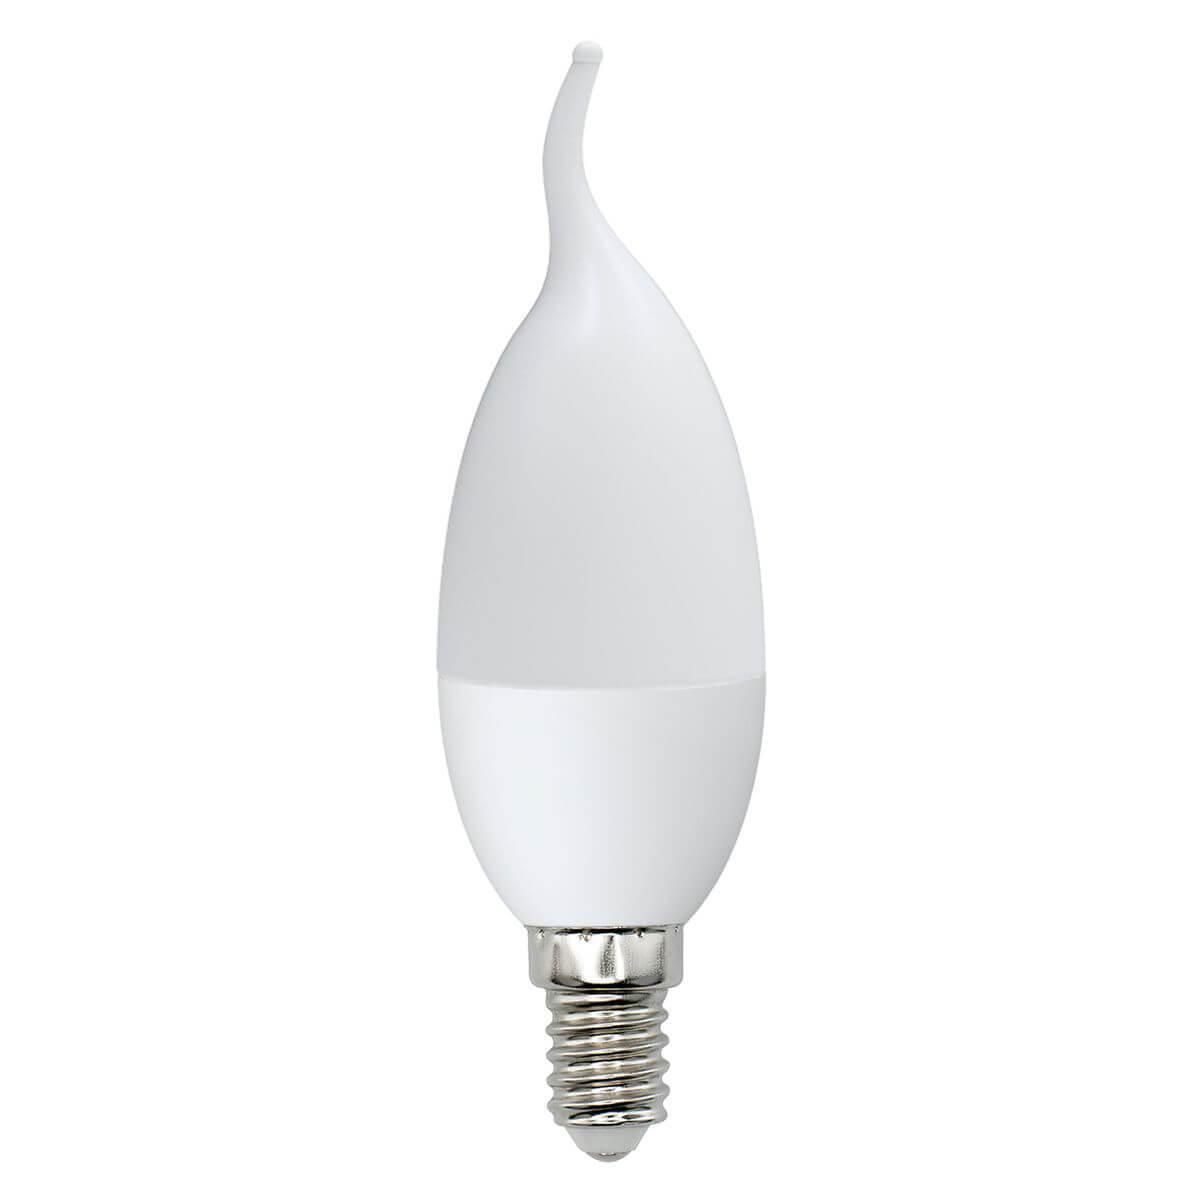 Лампа светодиодная (UL-00000308) E14 6W 3000K матовая LED-CW37-6W/WW/E14/FR/O лампа светодиодная ul 00001554 r7s 6w 3000k прозрачная led j78 6w ww r7s cl plz06wh